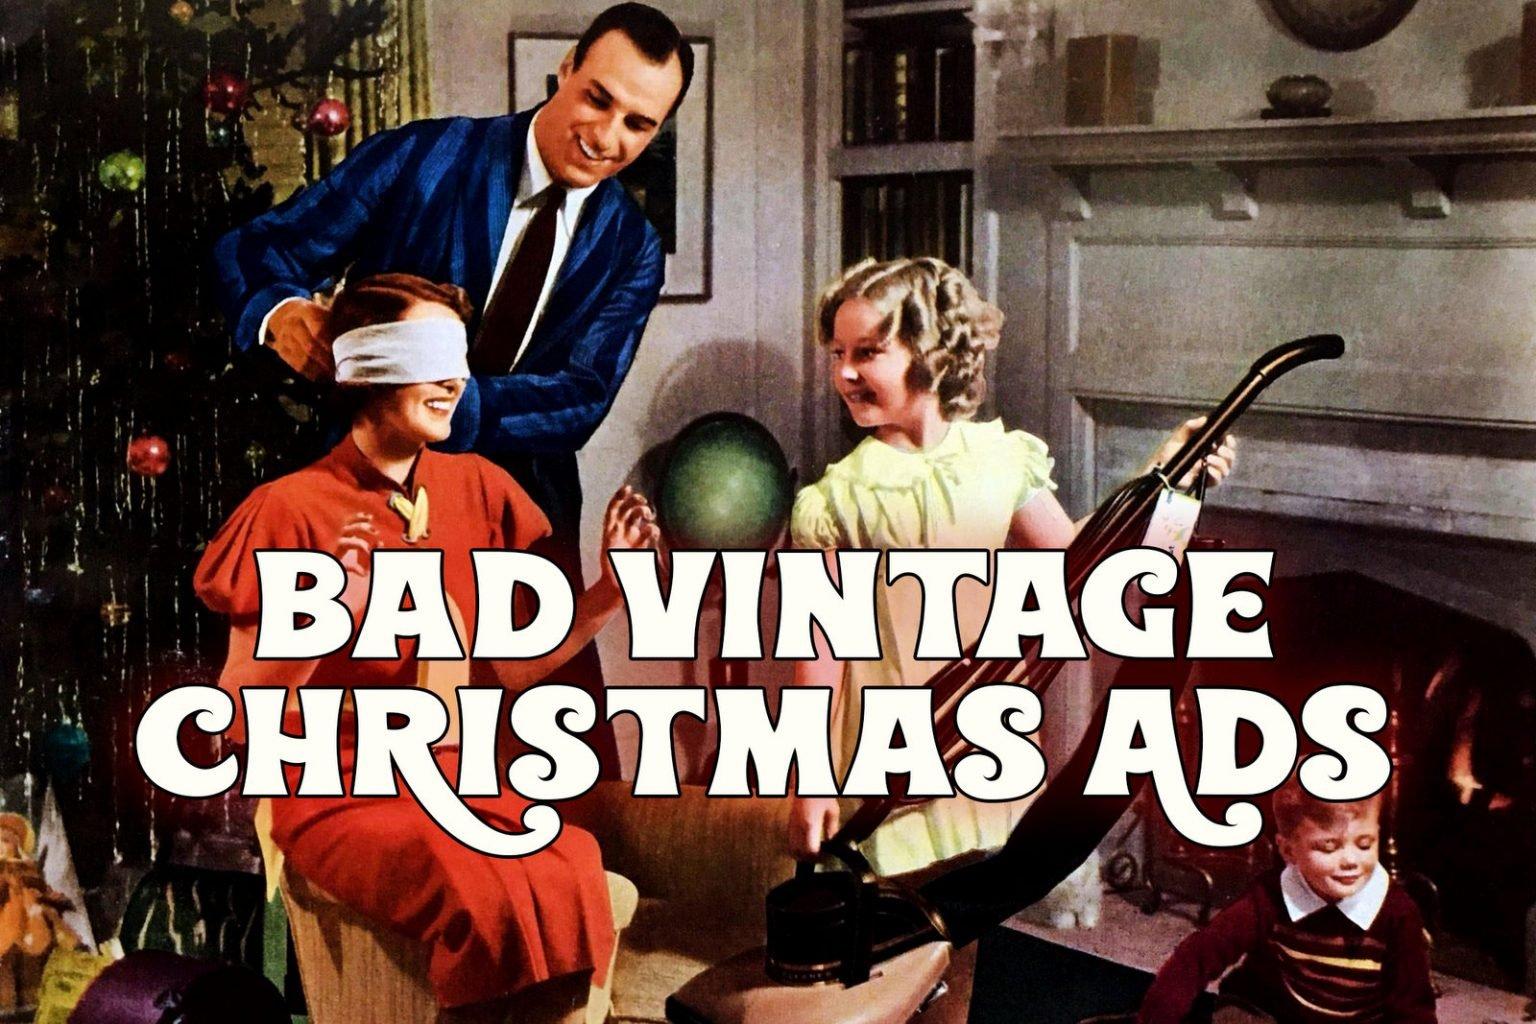 Bad vintage Christmas ads